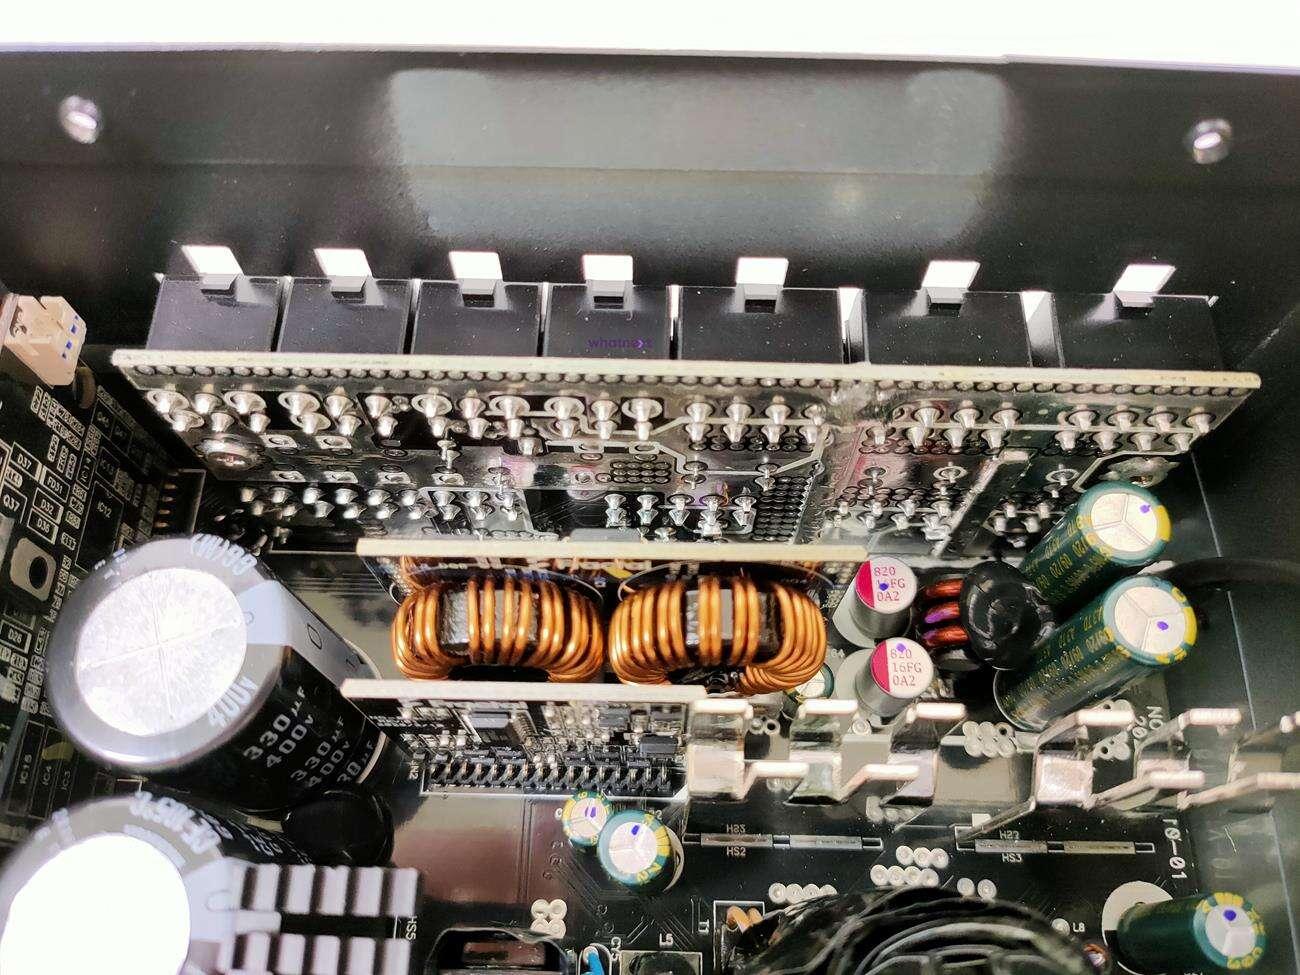 test Fractal Design ION Gold 850W, recenzja Fractal Design ION Gold 850W, opinia Fractal Design ION Gold 850W